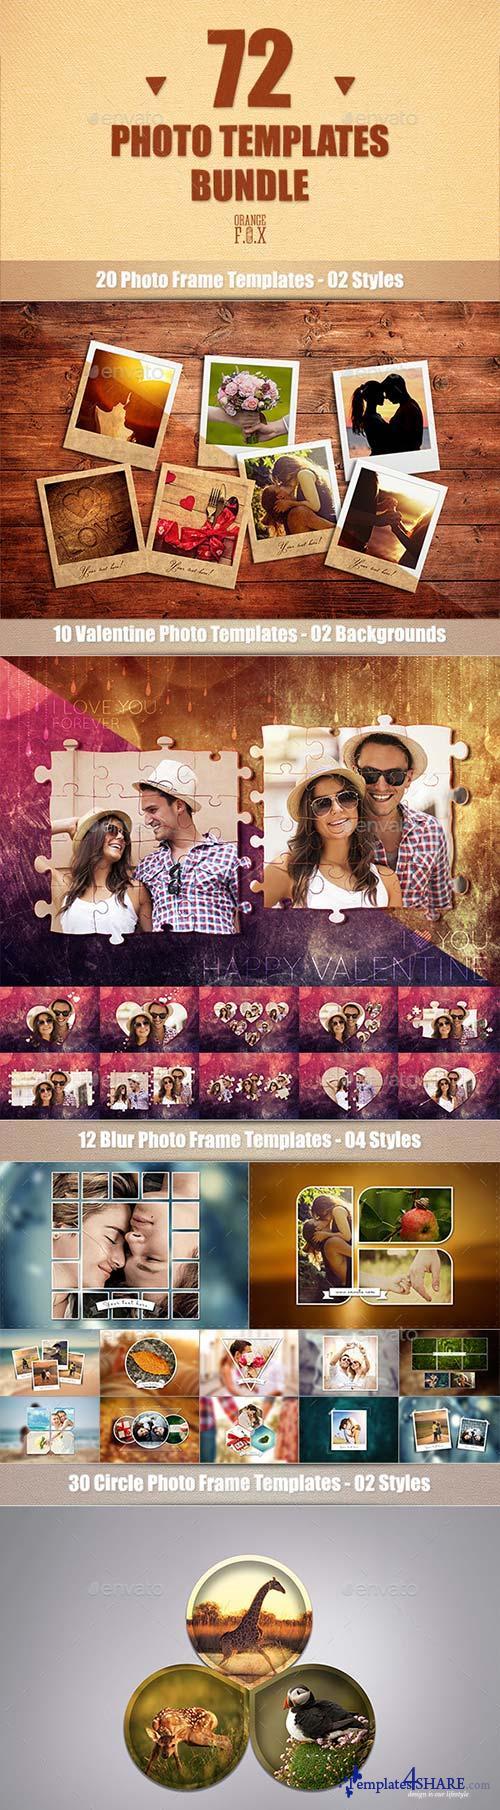 GraphicRiver 72 Photo Templates Bundle